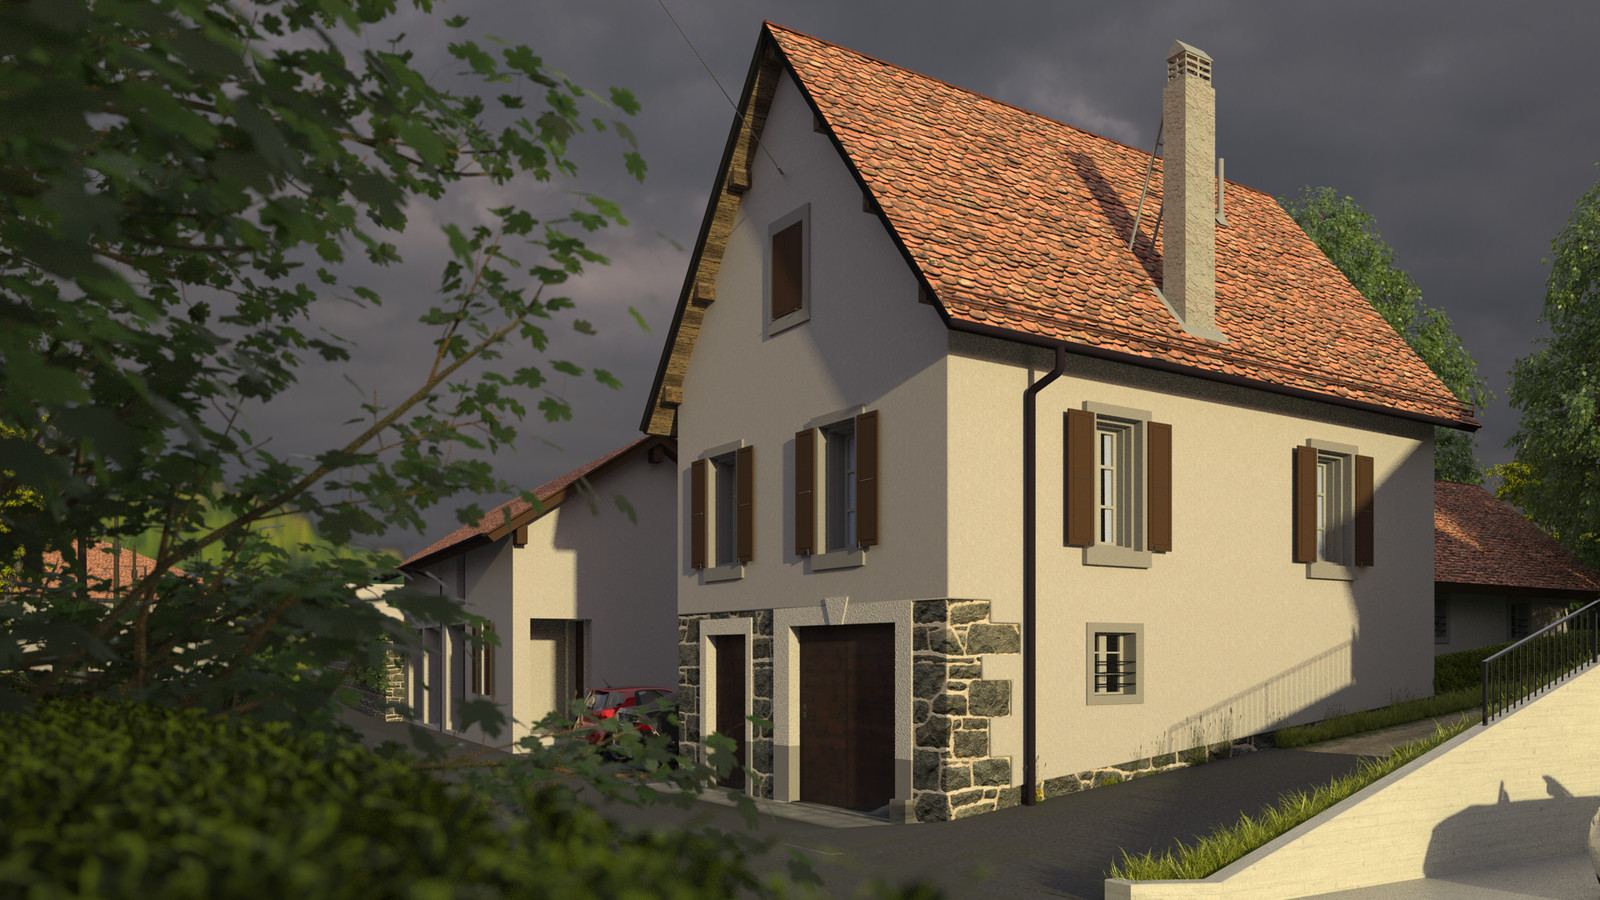 SketchUp + Thea Render  Little Swiss House Scene 28 0743 Cloudy Morning Sun 02 HD 1920 x 1080 Presto MC